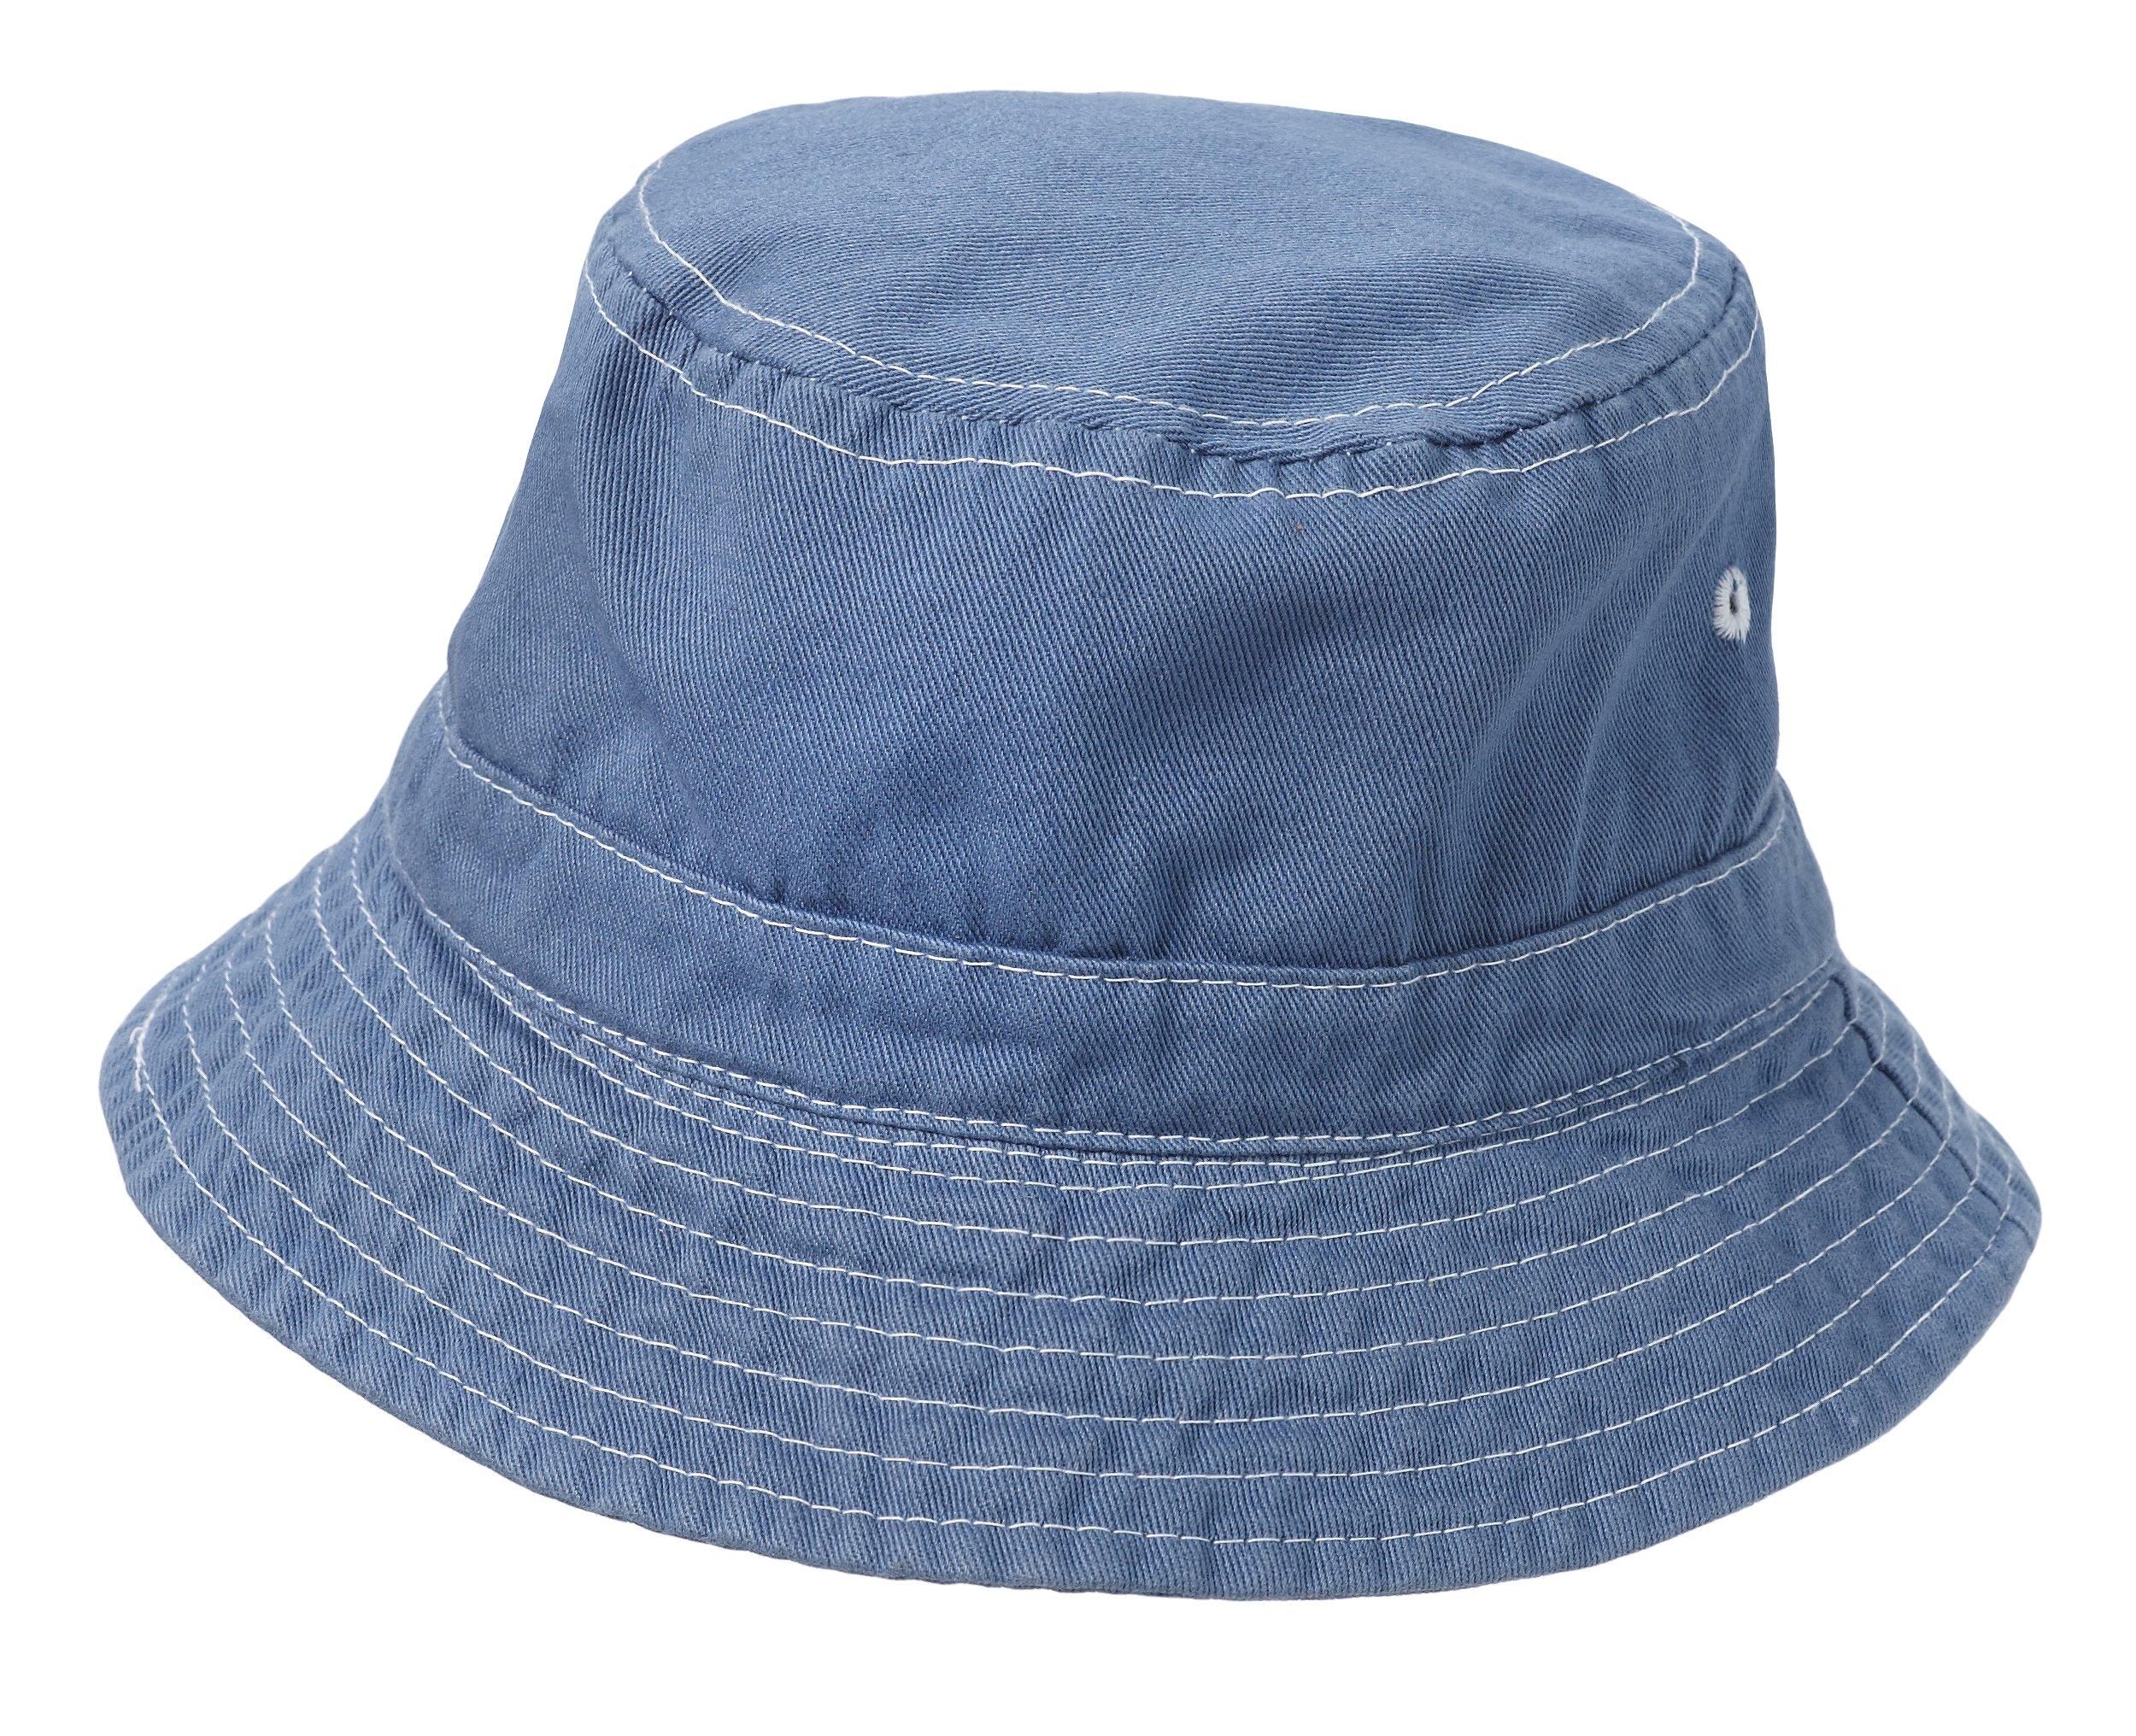 City Threads Little Boys' and Girls' Solid Wharf Hat Bucket Hat For Sun Protection SPF Beach Summer - Denim Blue - XL(4-6)